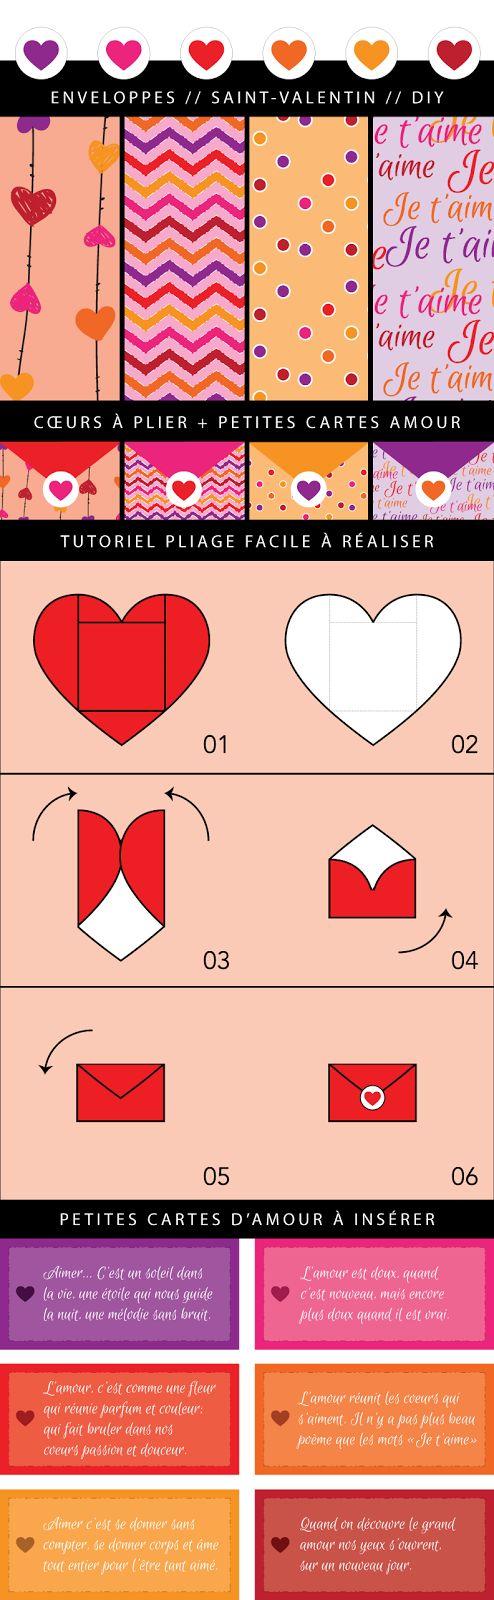 "Nadi[Art]Design: Coeurs à plier / Saint-Valentin / DIY  ................. #GlobeTripper® | https://www.globe-tripper.com | ""Home-made Hospitality"" | http://www.globe-tripper.tumblr.com"